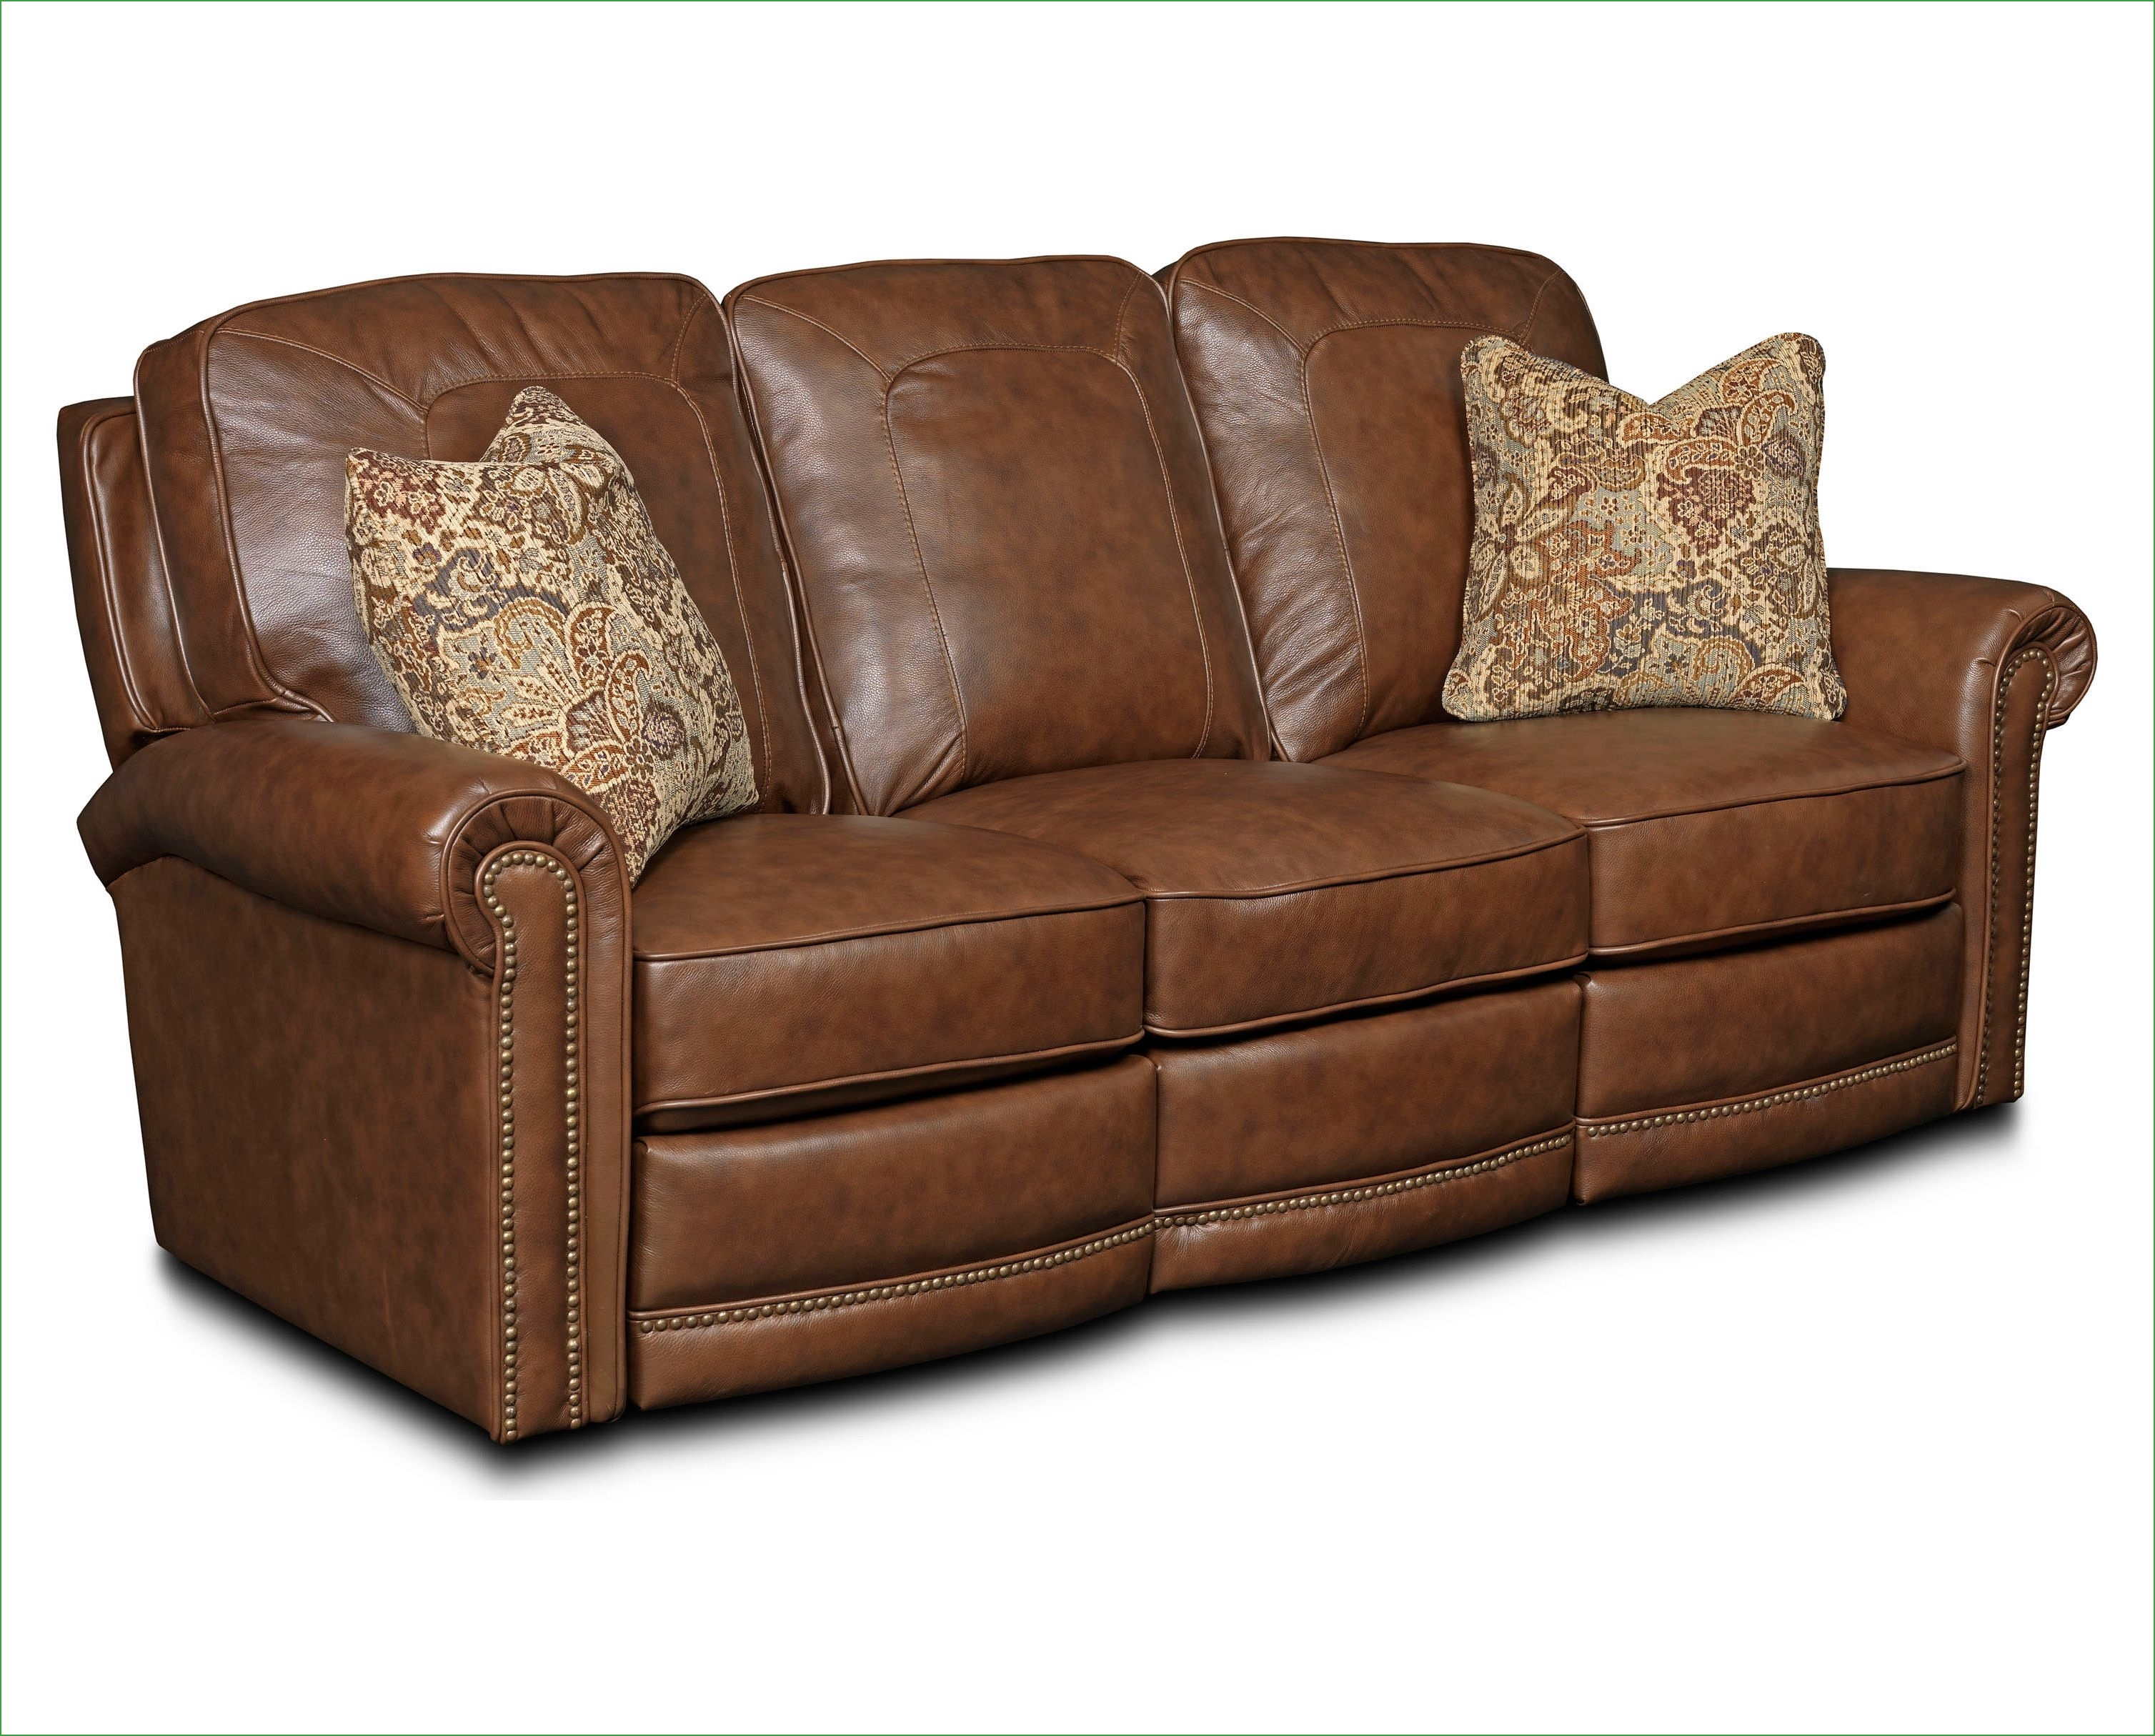 15 s Bentley Sectional Leather Sofa